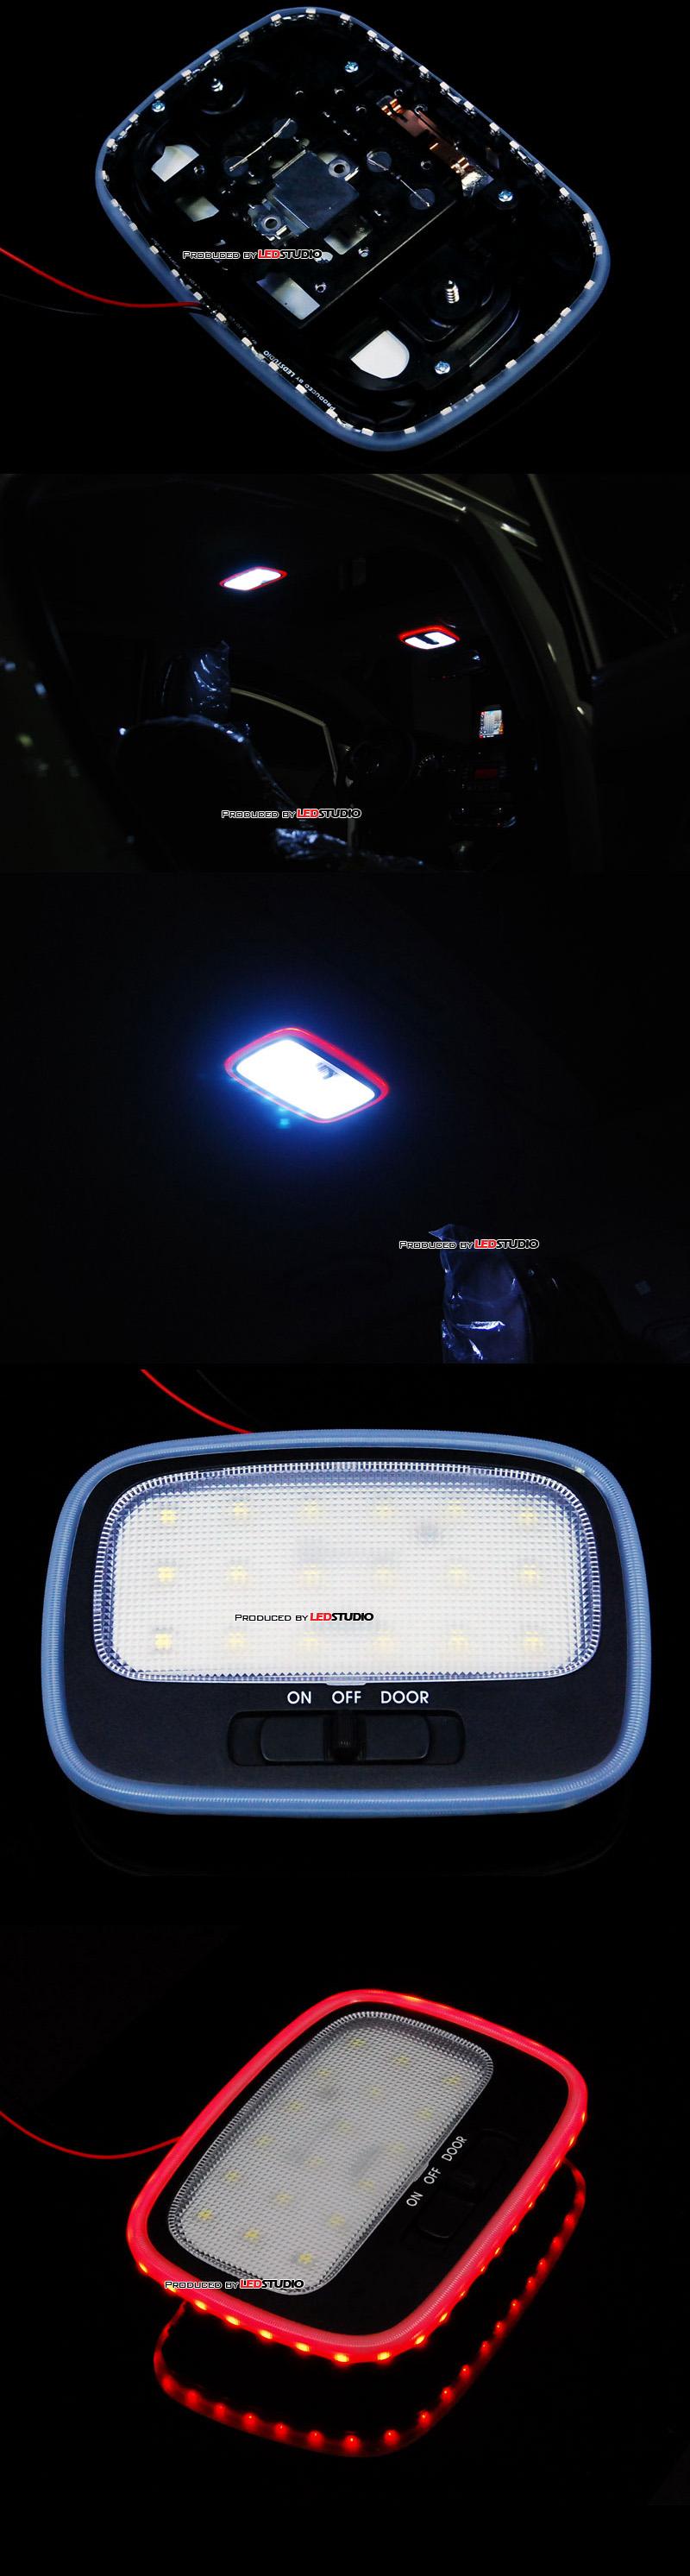 Платы + рассеиватели подсветки плафонов KIA SPORTAGE 2011 (RML-12) (перед+центр)